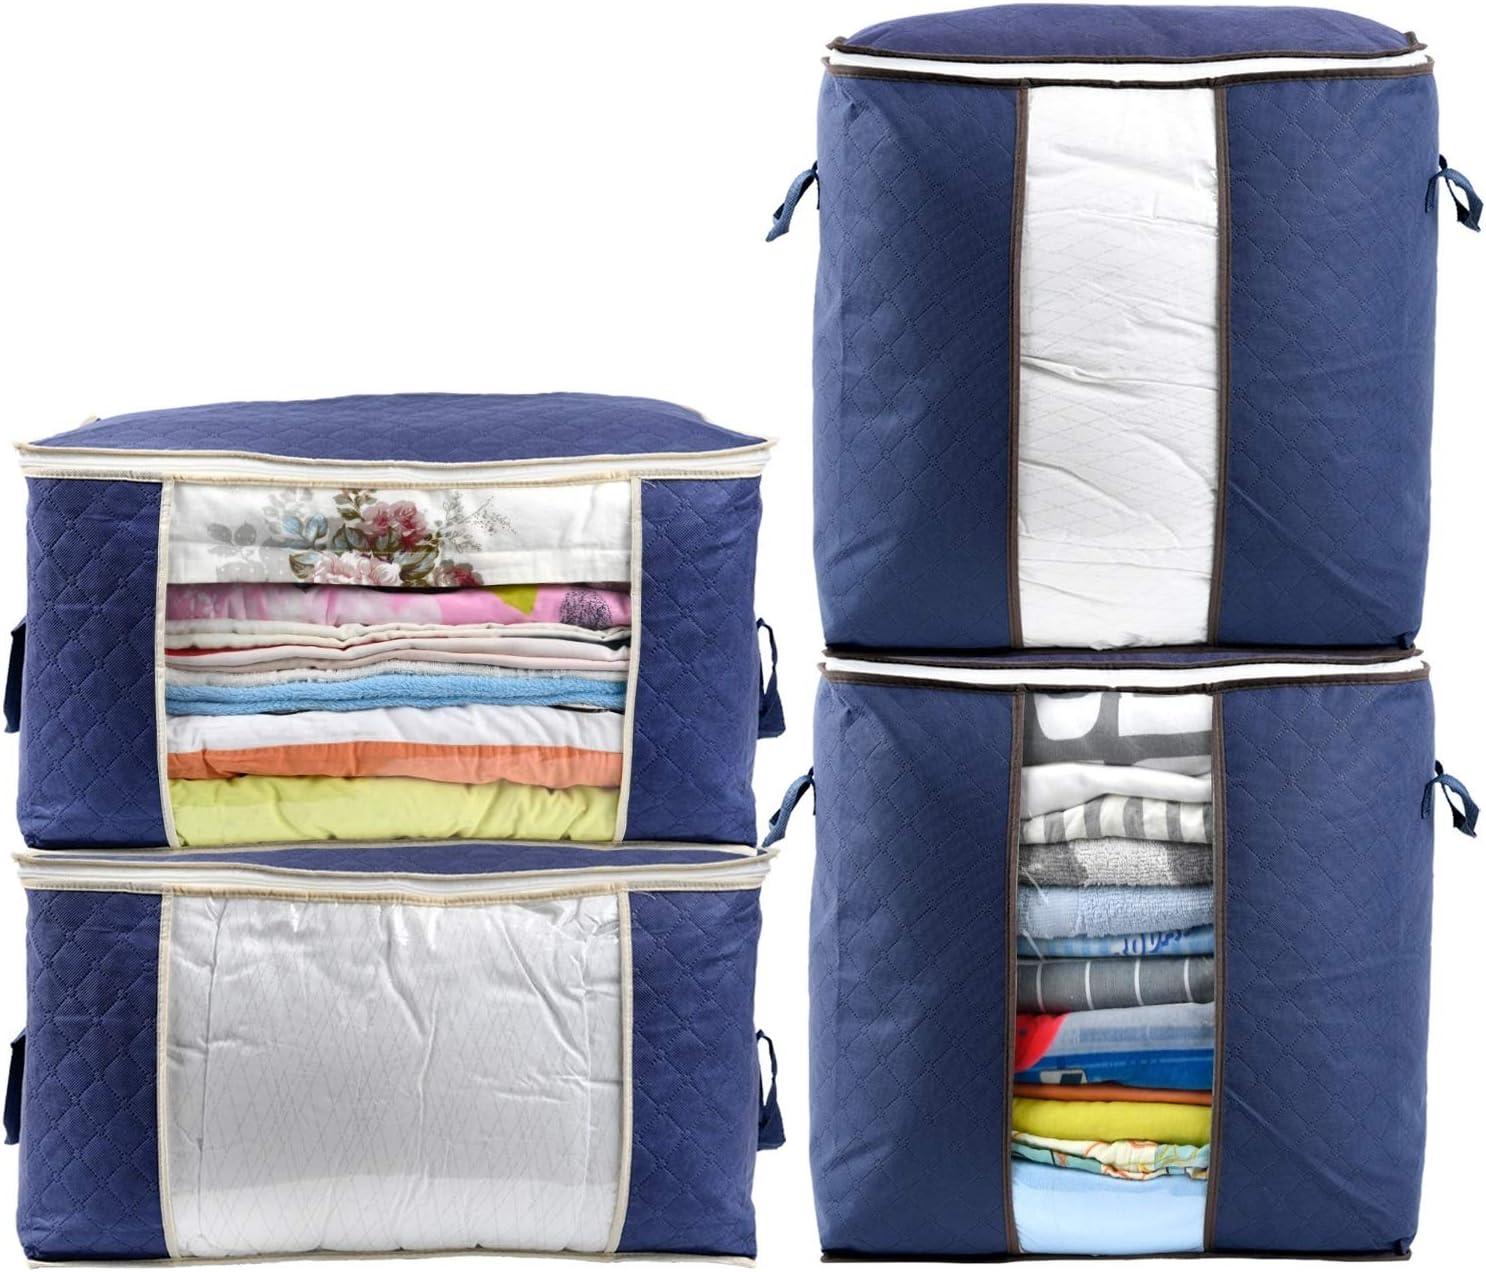 almohadas mantas ropa 4 piezas Merpin Bolsa de almacenamiento para almacenamiento de ropa plegable con cremallera para edred/ón cojines de jard/ín ropa de cama colchas